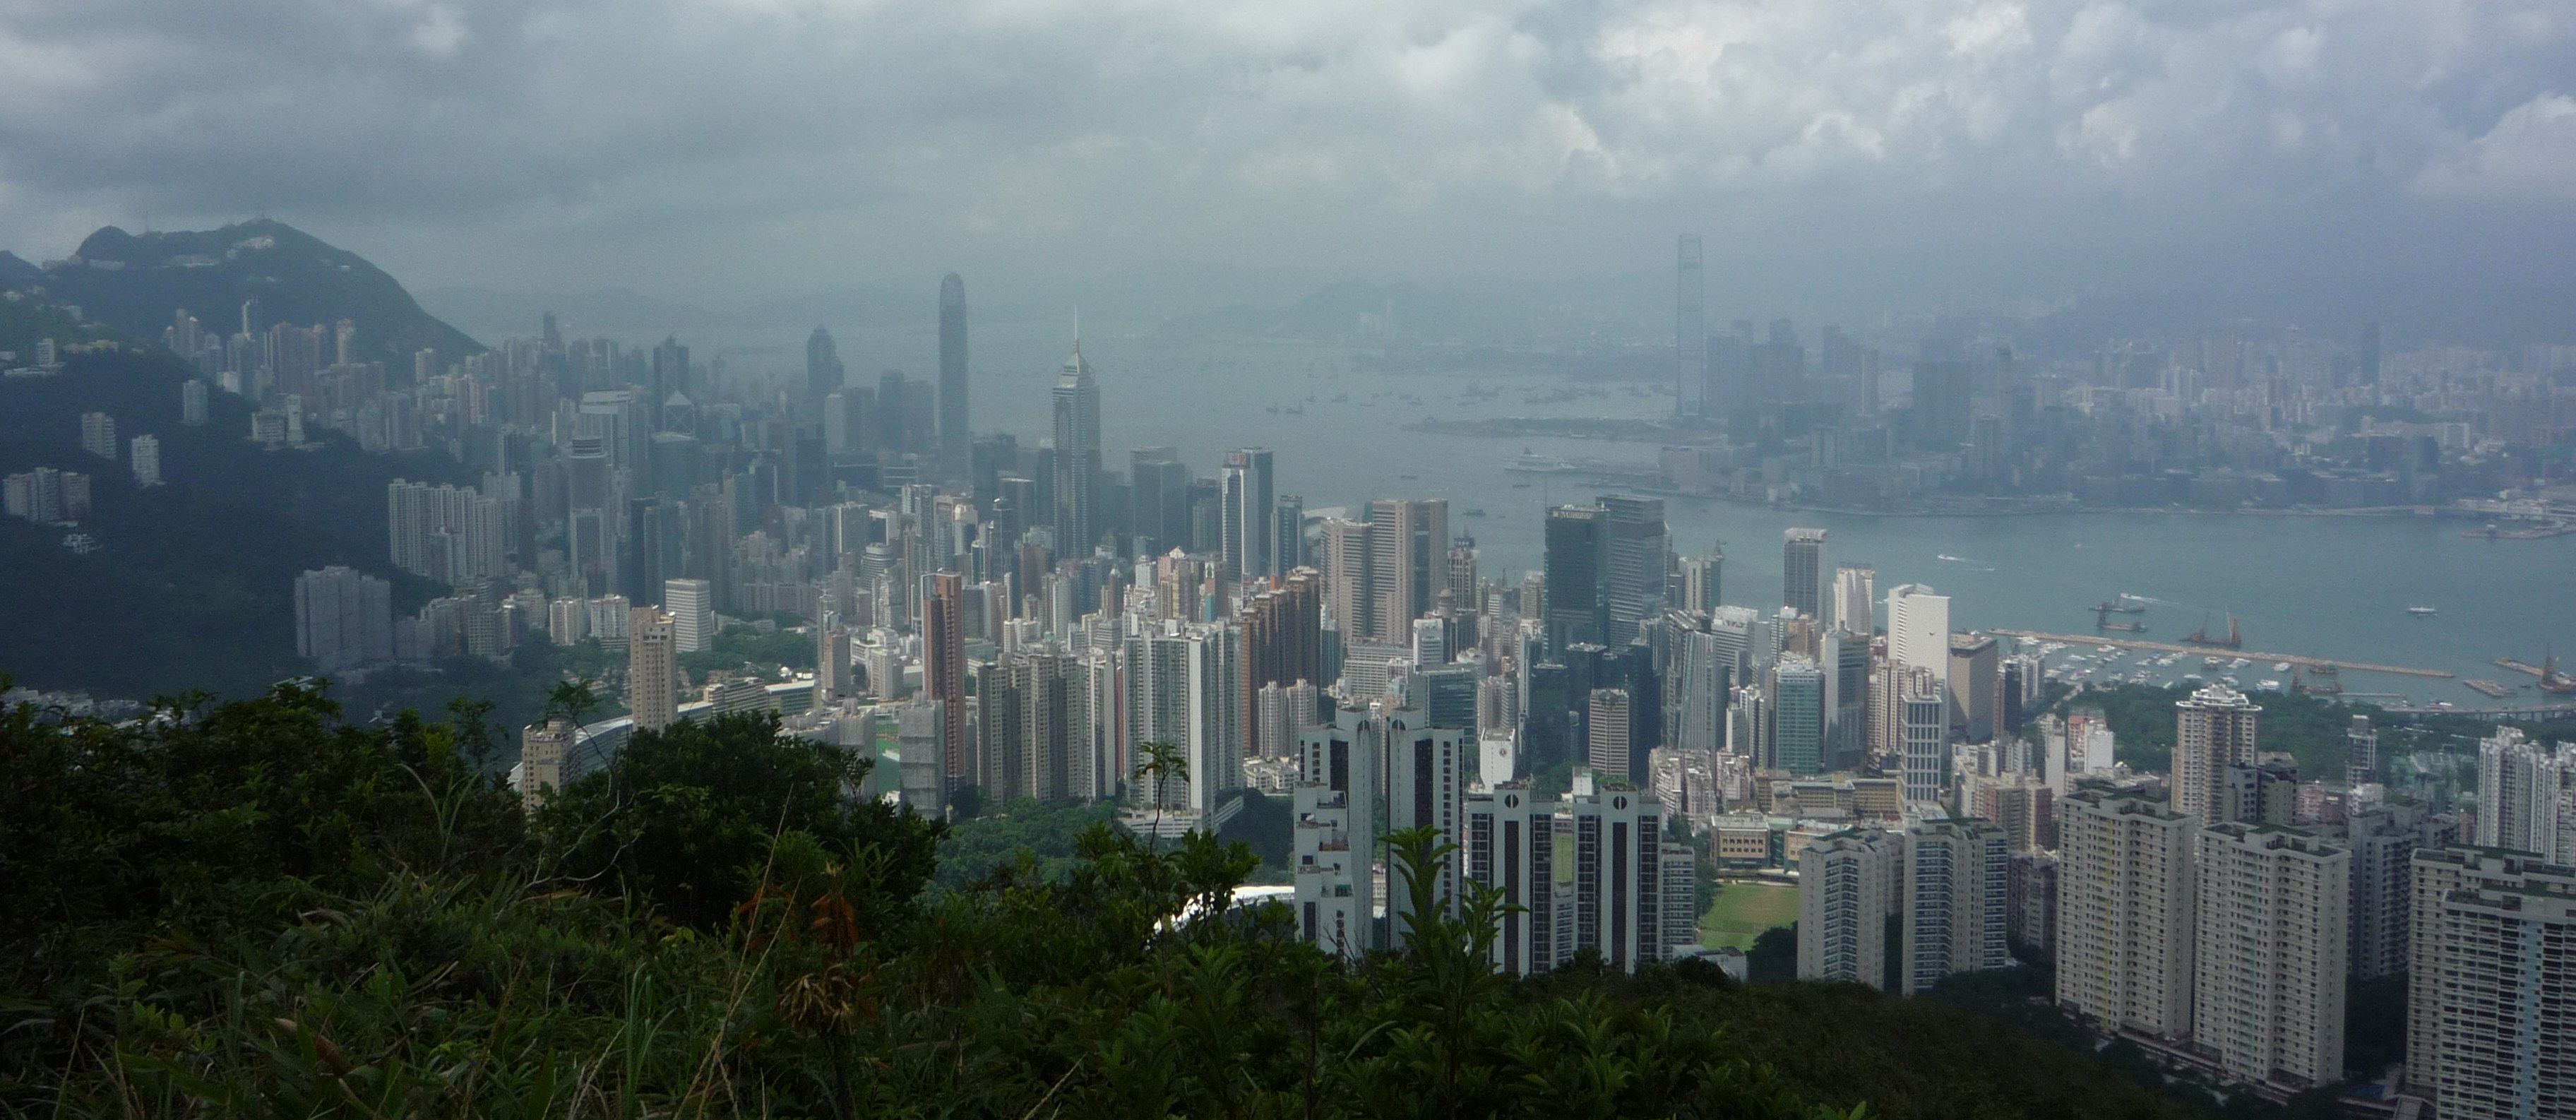 Jardines lookout city hong kong hd wallpapers and photos for Jardin hong kong